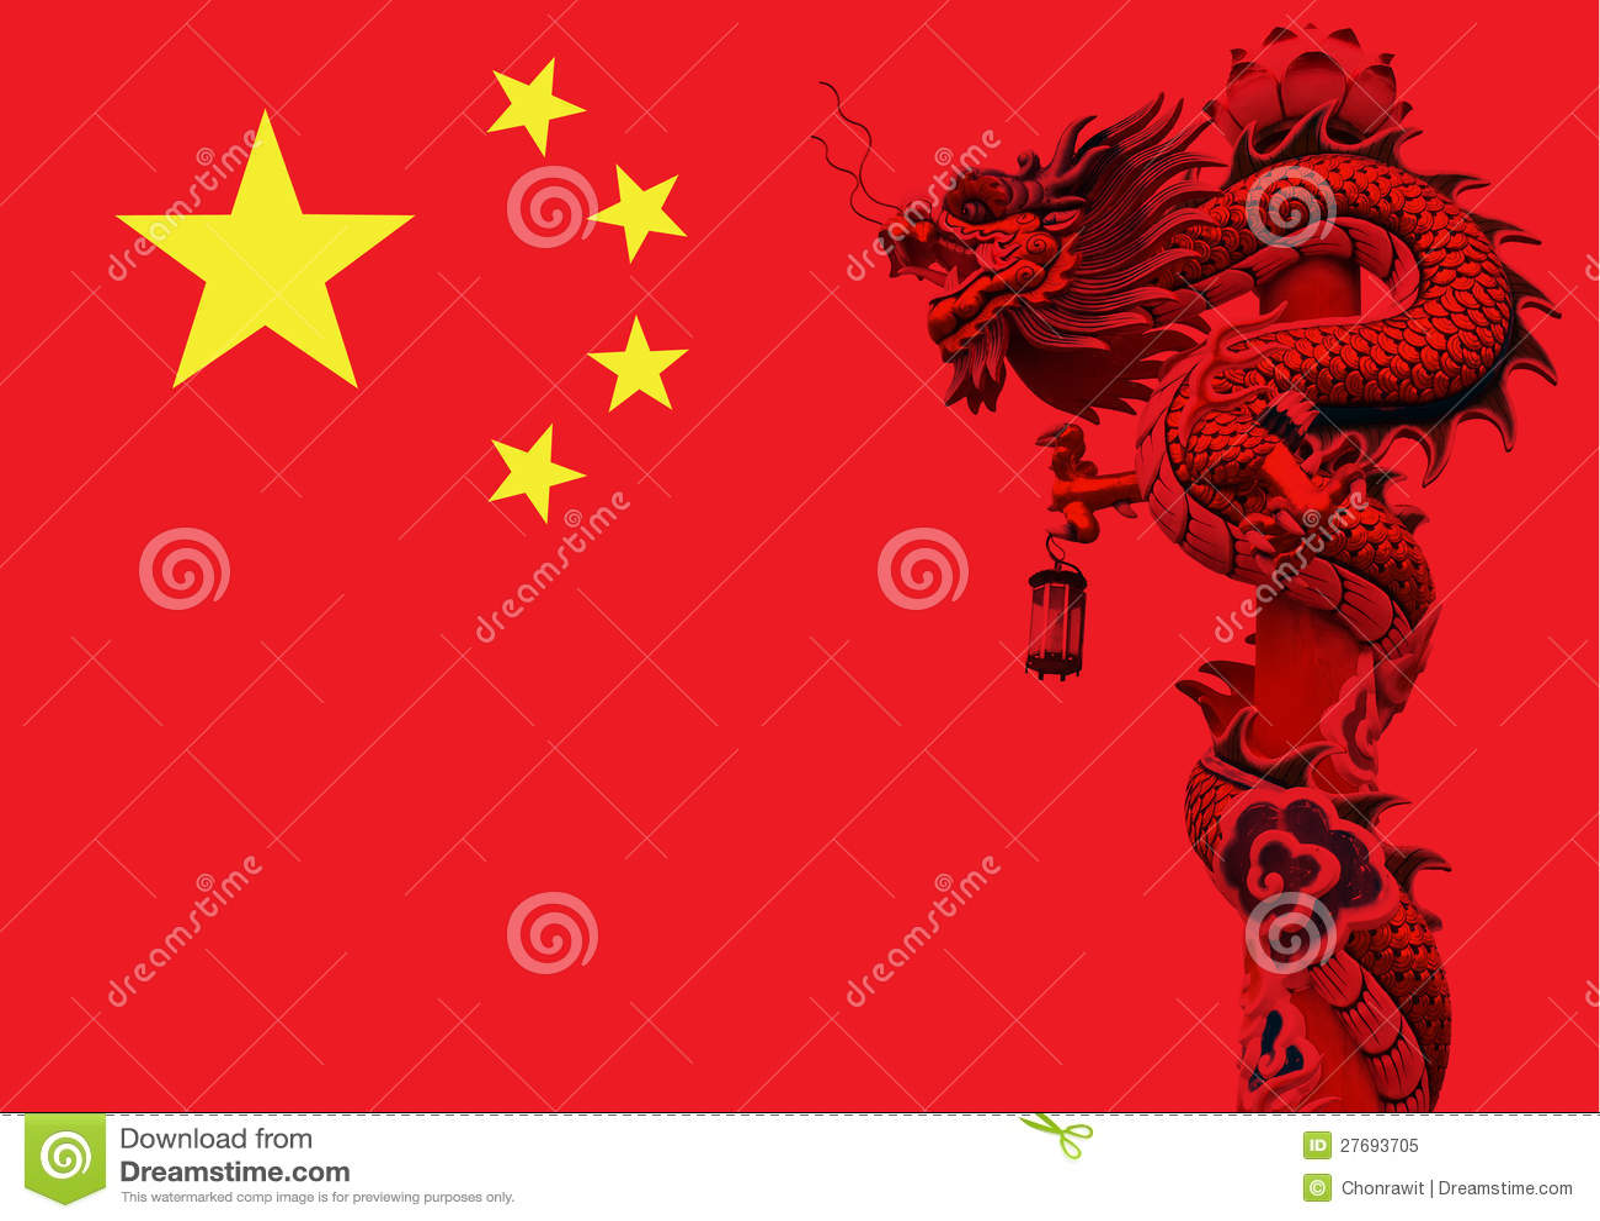 chinese dragon flag  royalty free stock photo